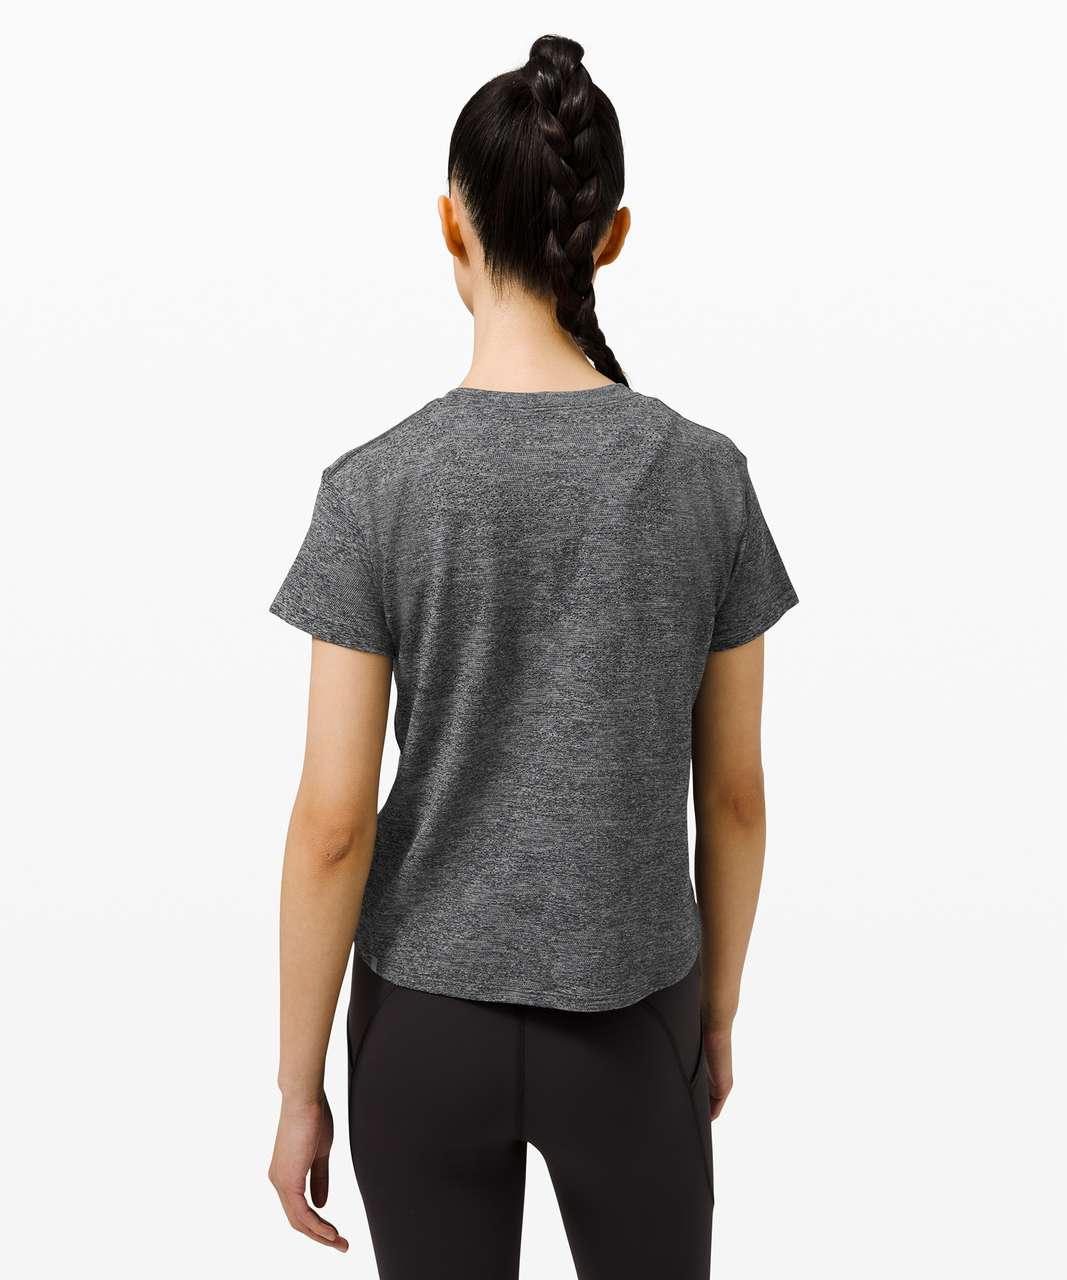 Lululemon Train to Be Short Sleeve *Camo - Dot Camo Rhino Grey / Black